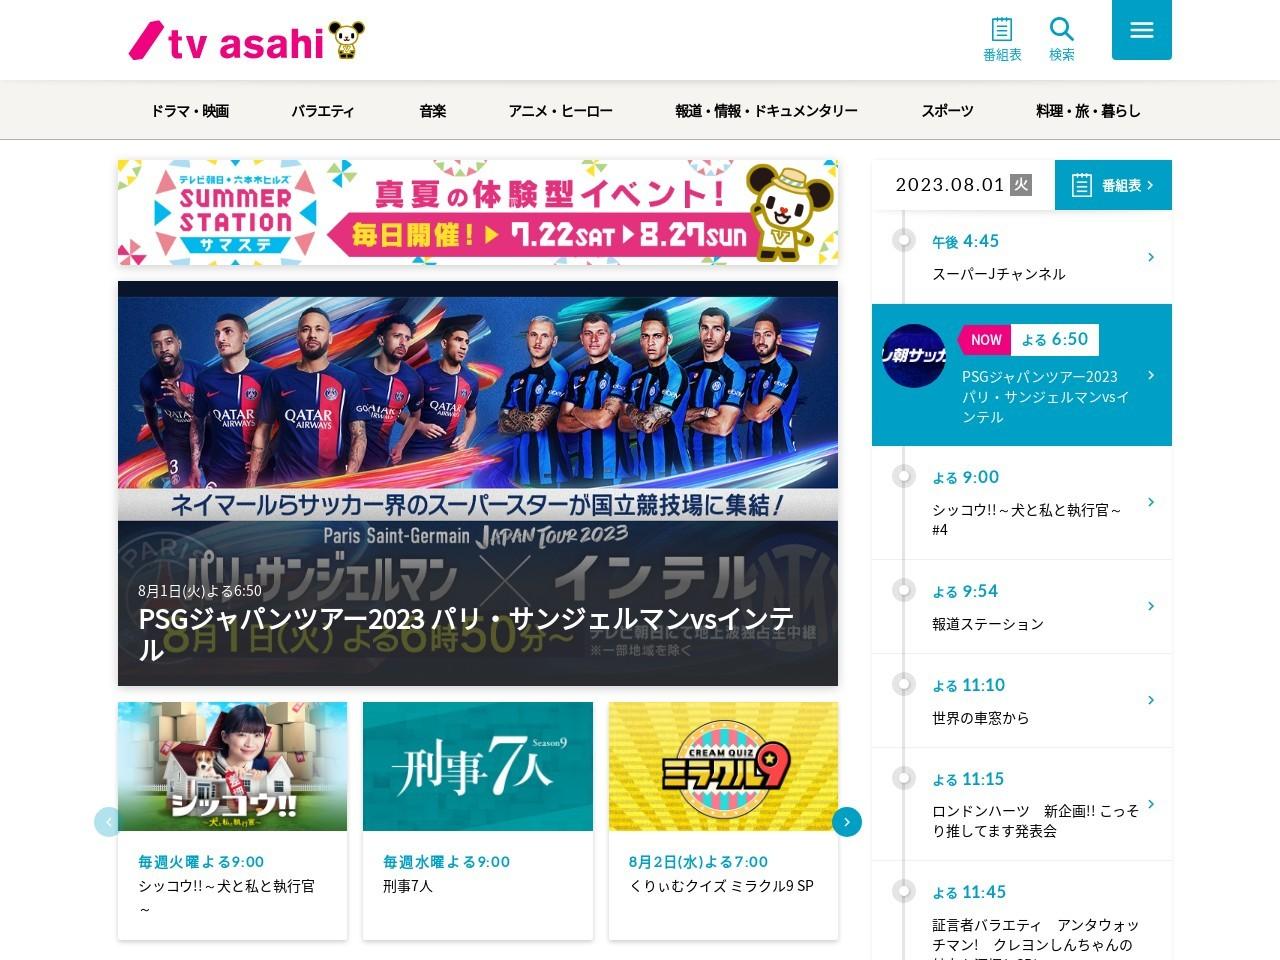 http://www.tv-asahi.co.jp/shirushirusunday/